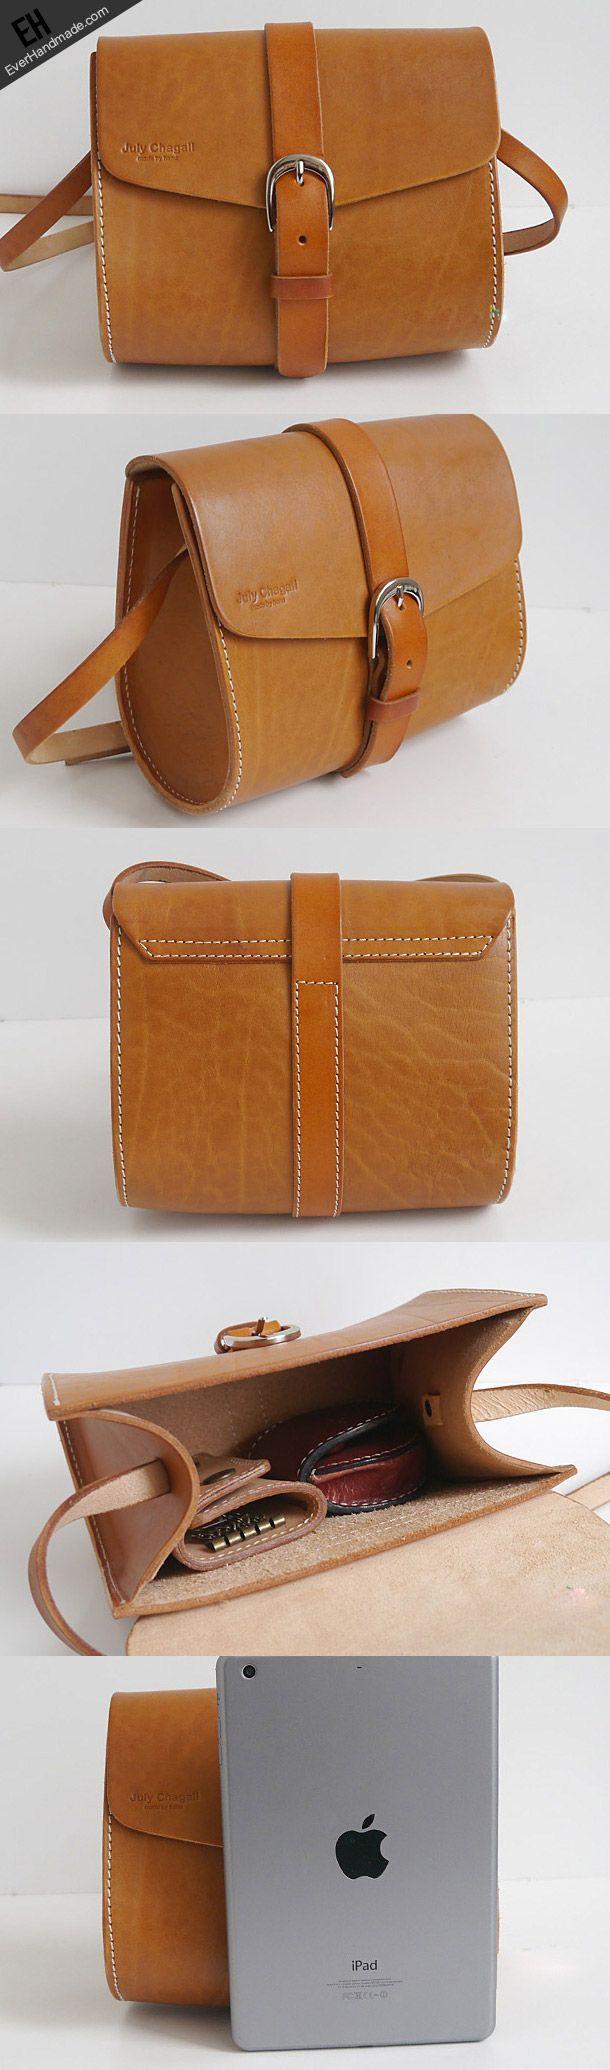 d45ec3e82a807e5570d248be5c7a9177.jpg (610×2070) Handmade Handbags & Accessories - amzn.to/2ij5DXx Clothing, Shoes & Jewelry - Women - handmade handbags & accessories - http://amzn.to/2kdX3h7